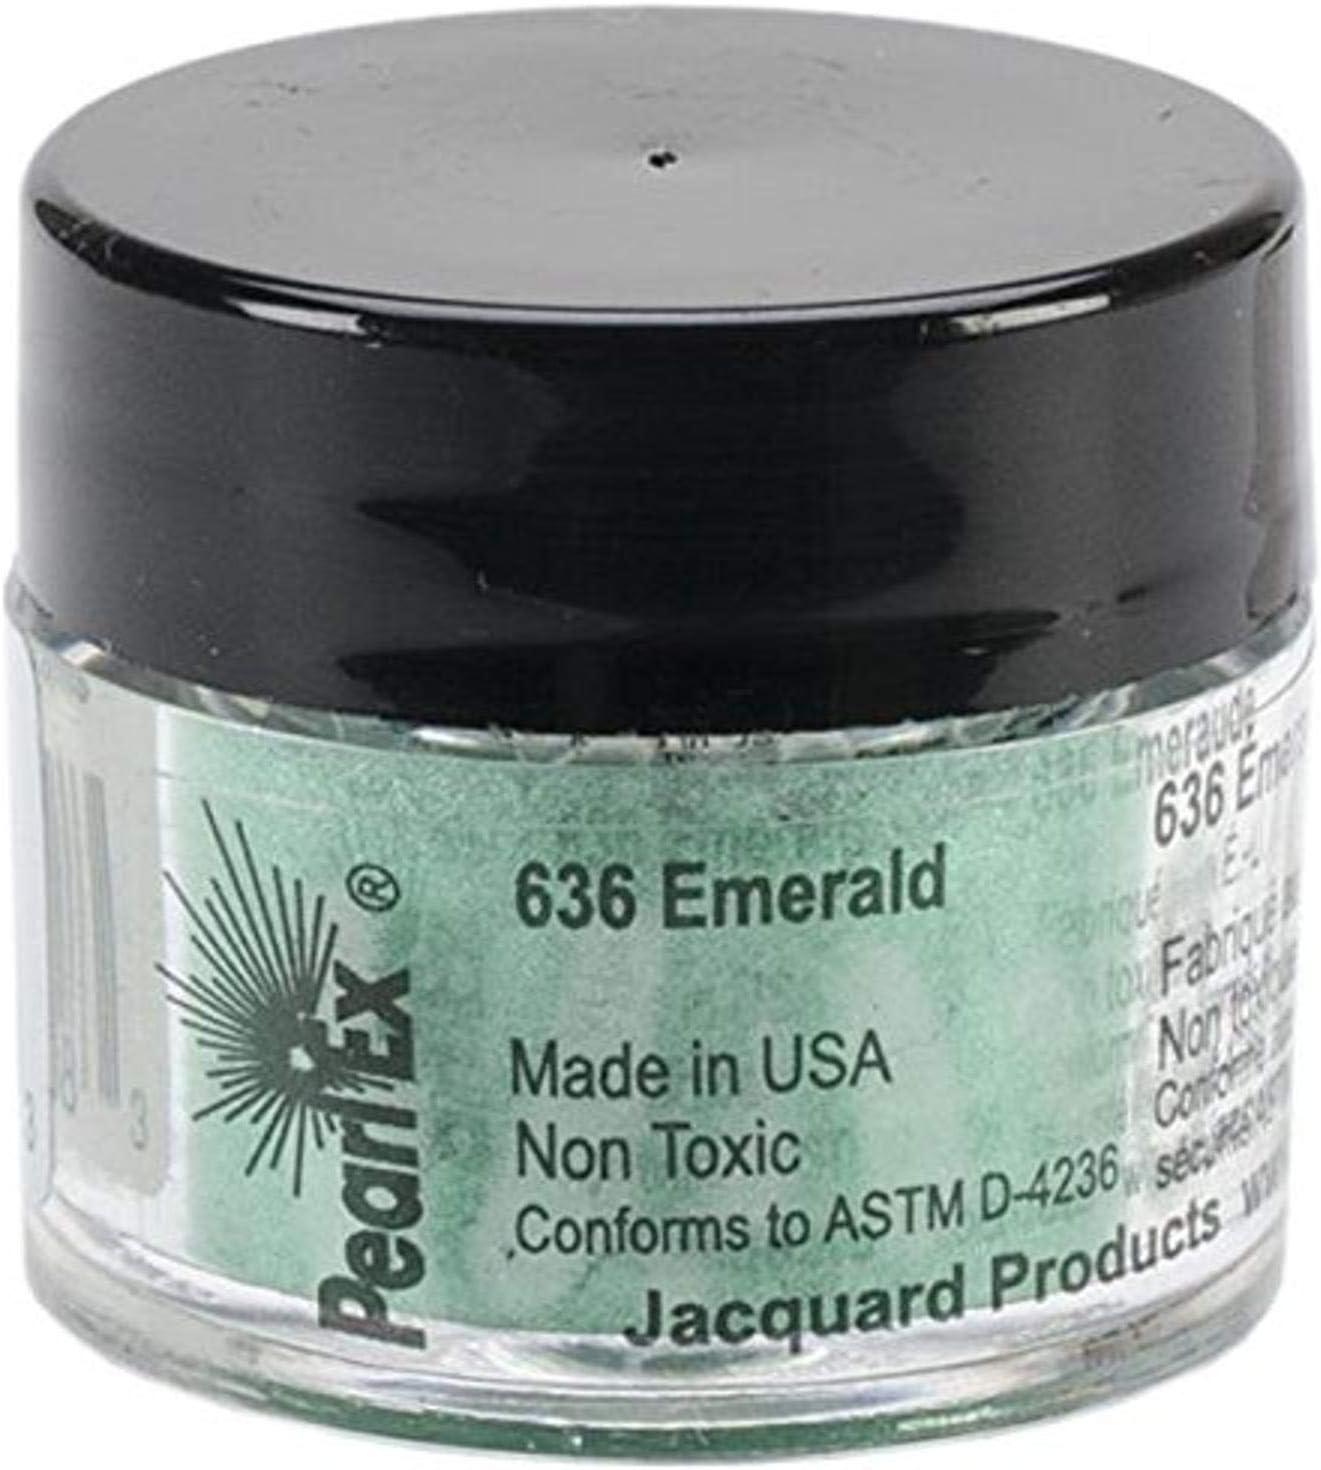 Jacquard Pearl Ex Powdered Pigment 14g-Emerald